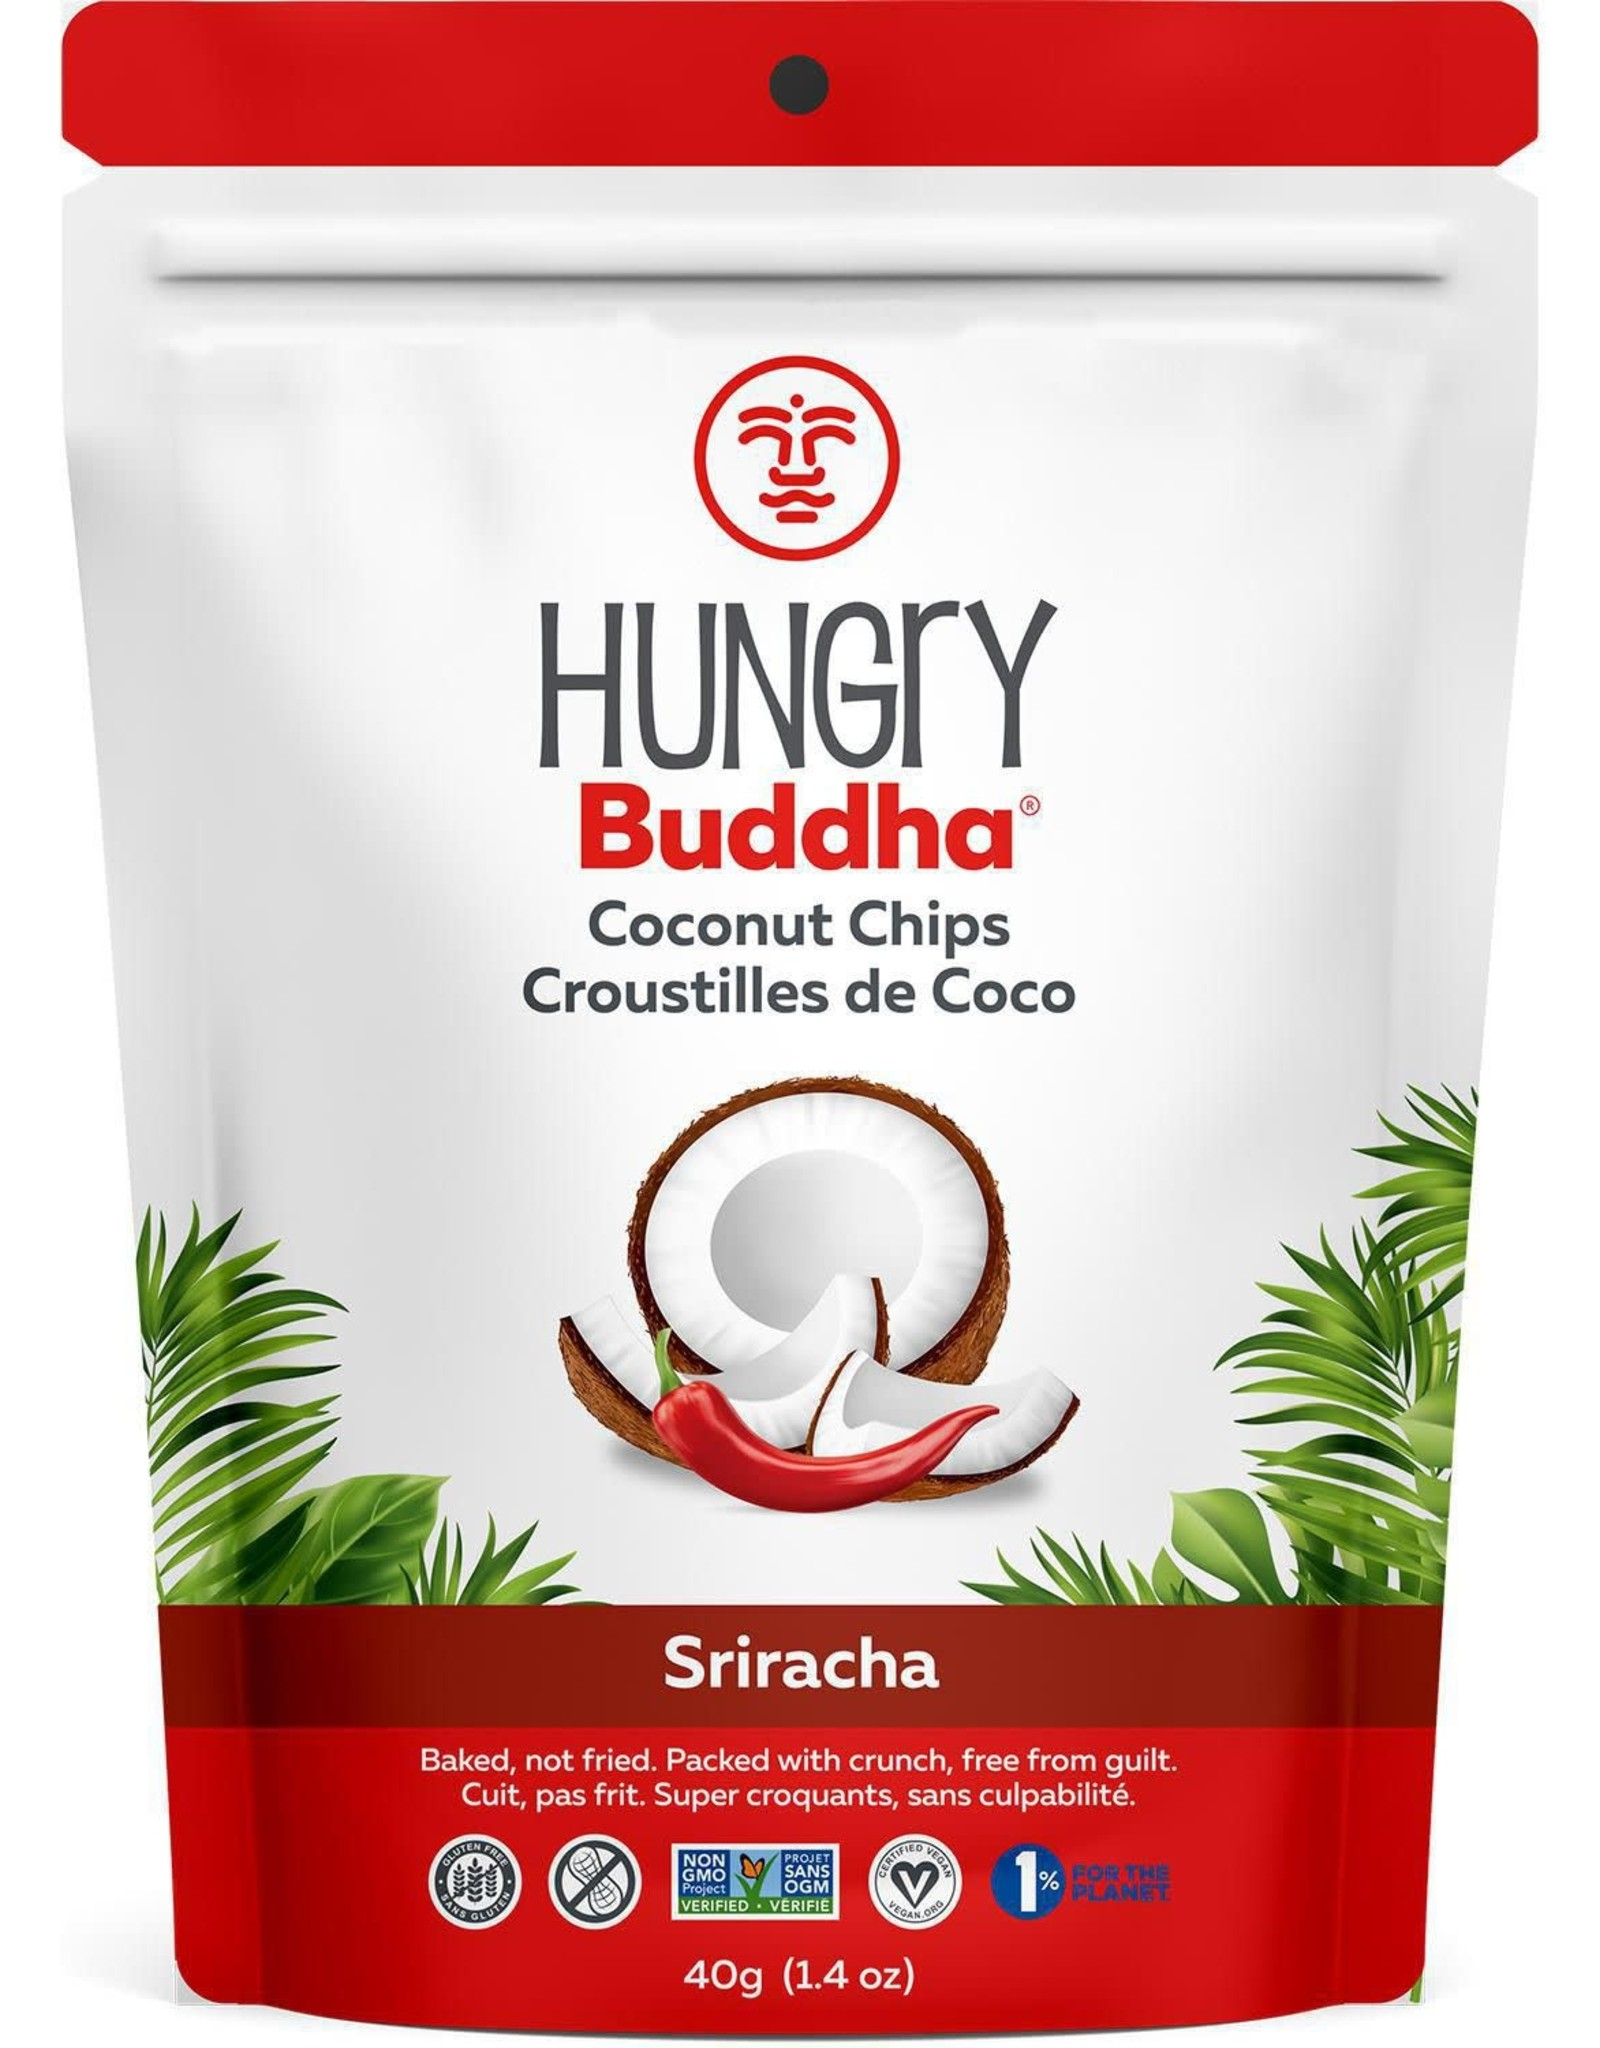 Hungry Buddha Hungry Buddha - Coconut Chips, Smokin Sriracha (40g)